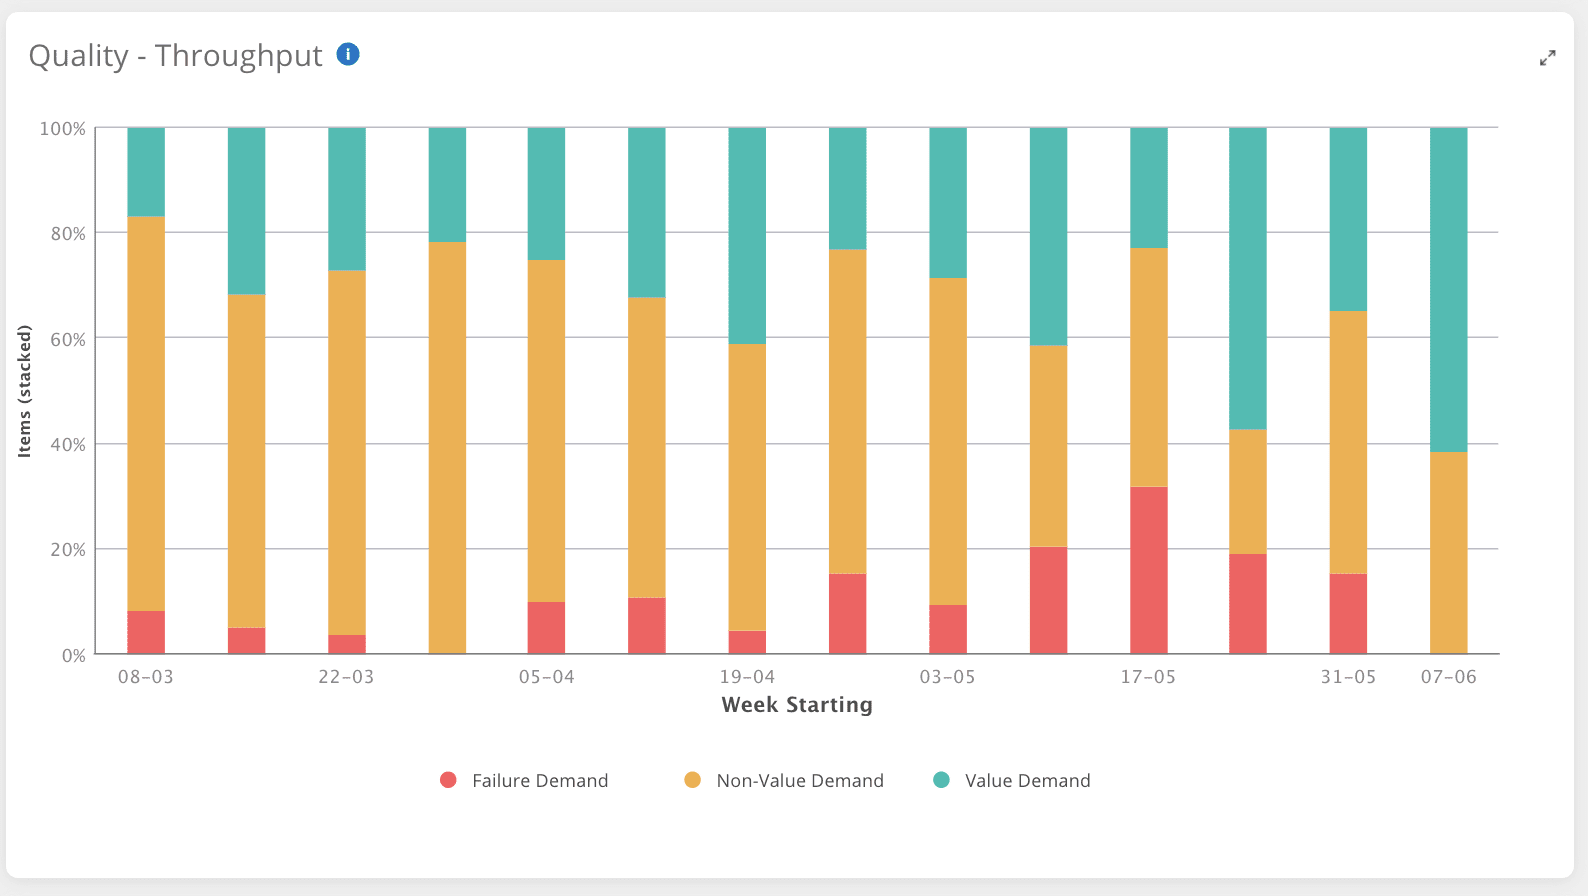 Quality trend analysis